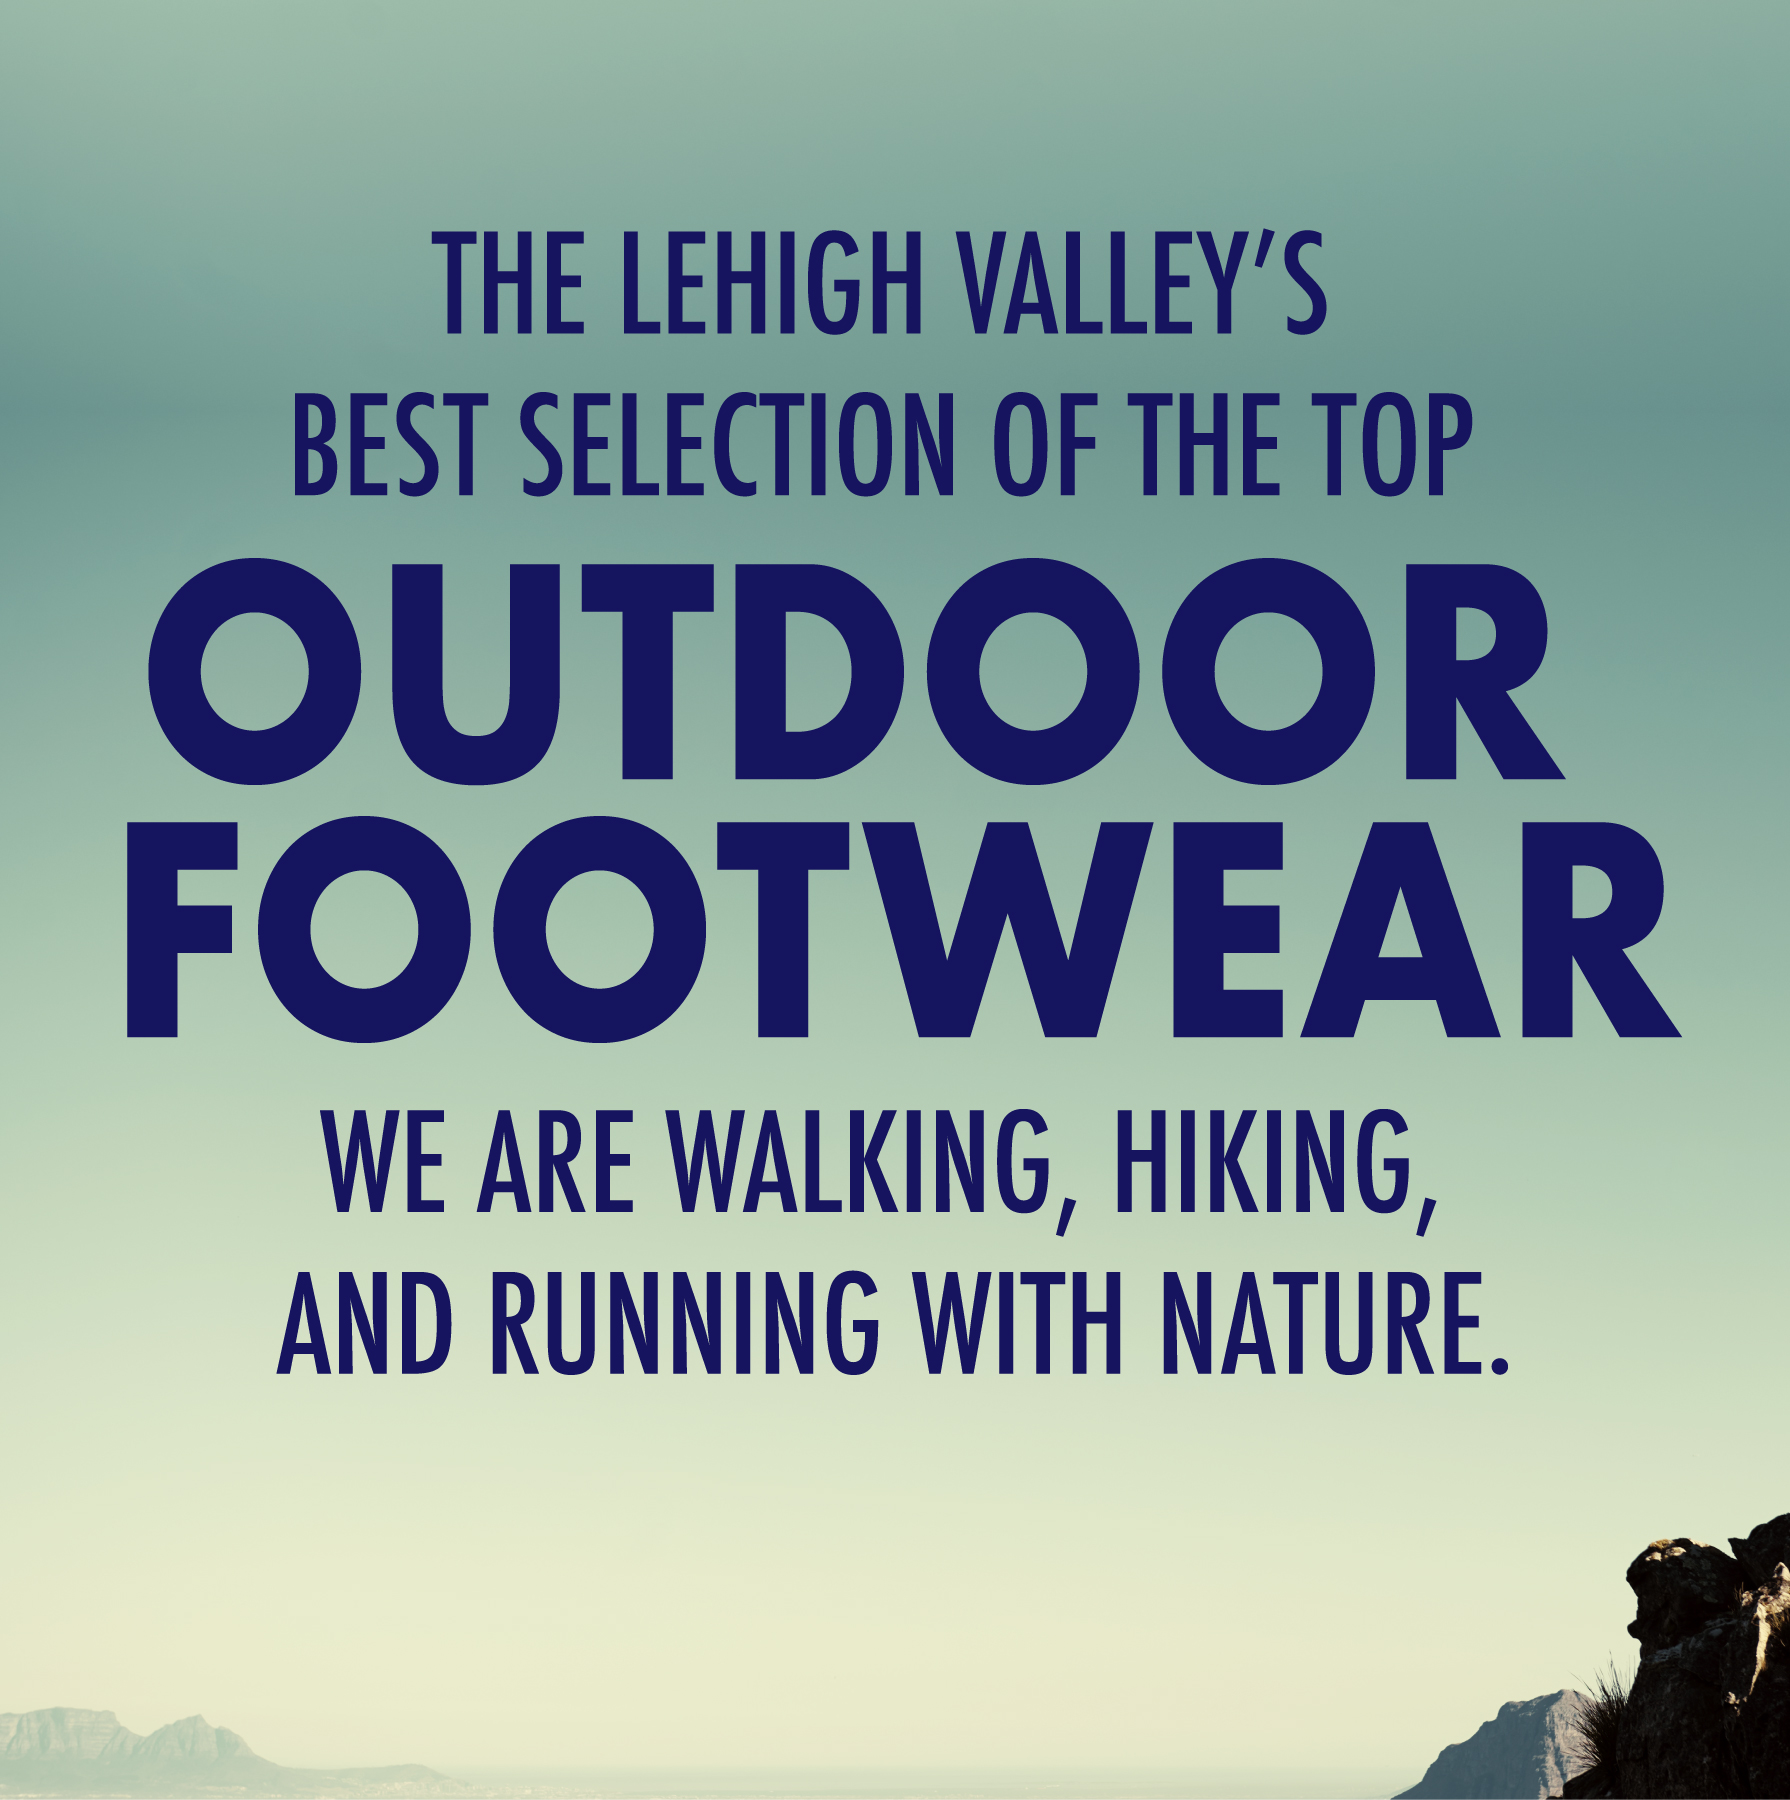 outdoor-foorwear-banner.jpg